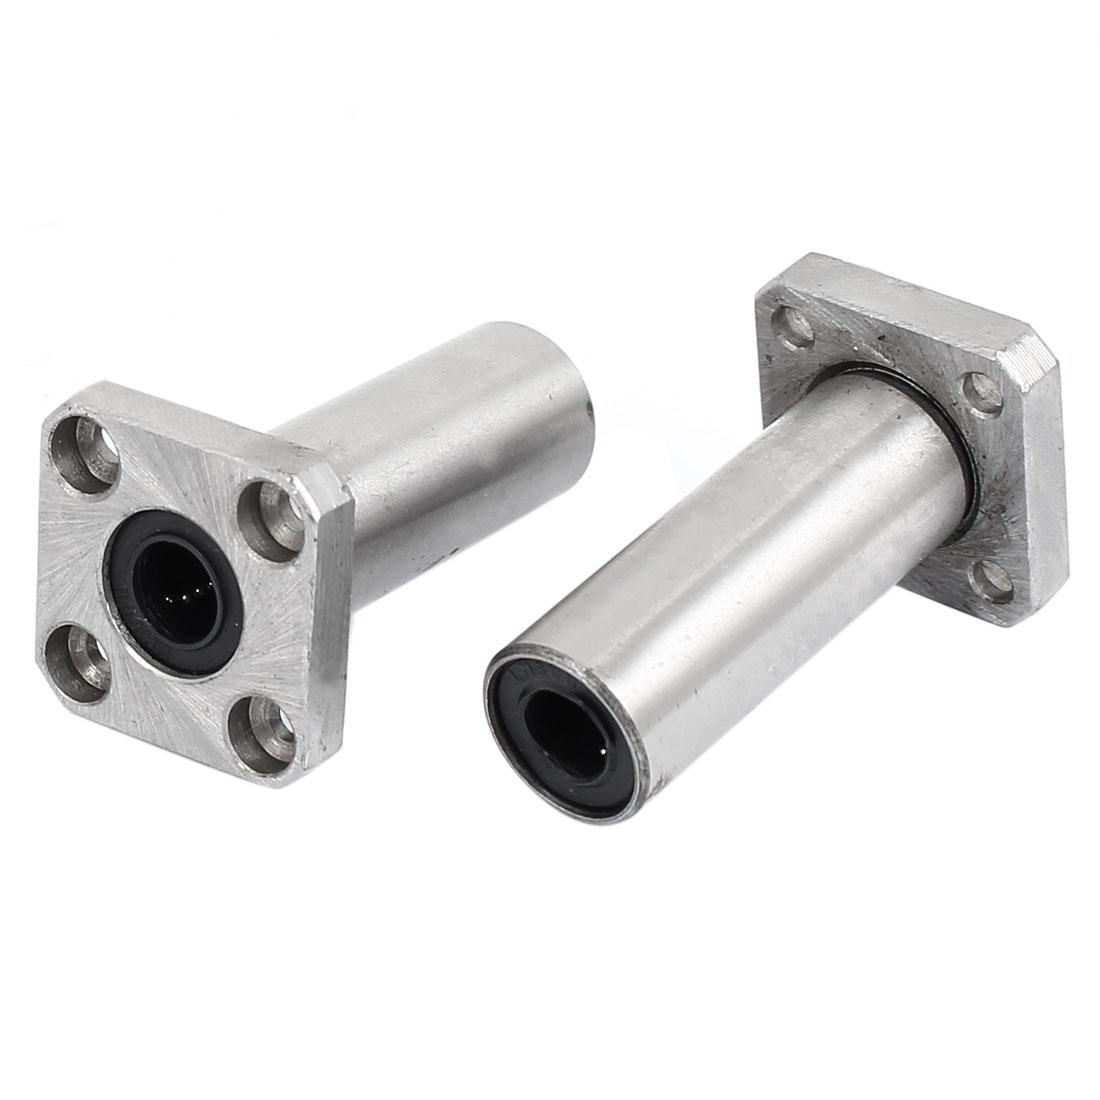 45mm x 25mm x 15mm LMF K8LUU Square Flange Linear Motion Bearing 2 Pcs